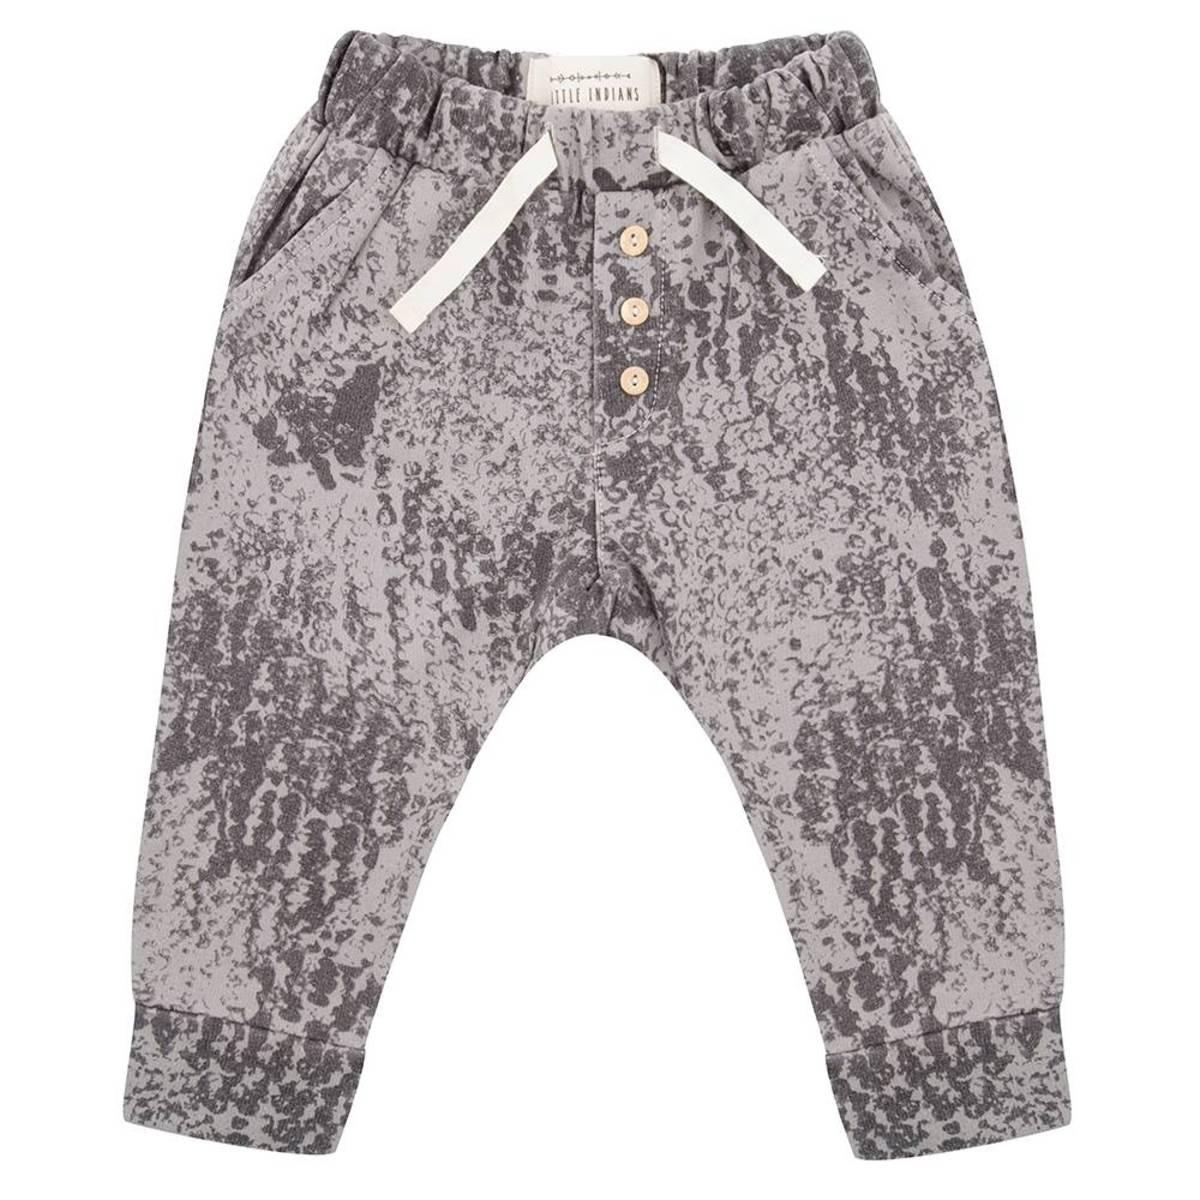 Bas Bébé Pantalon World Broek Gris - 9/12 mois Pantalon World Broek Gris - 9/12 mois